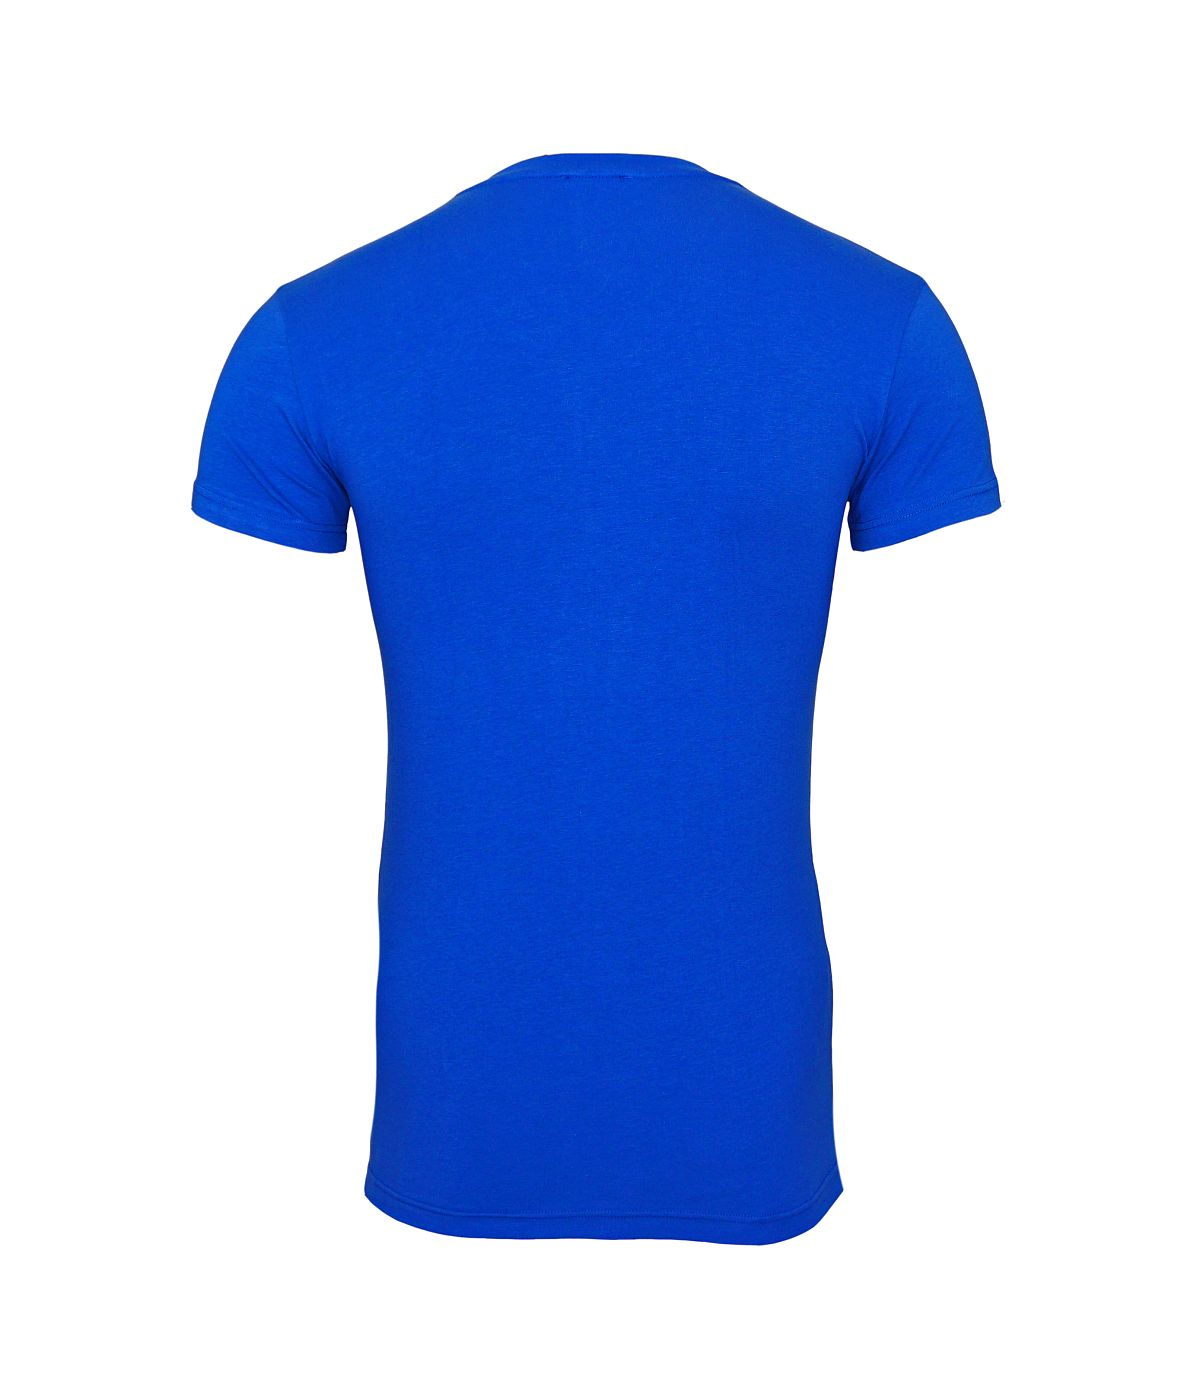 Emporio Armani T-Shirts V-Ausschnitt 110810 8A516 23233 MAZARINE SH18-EAT2